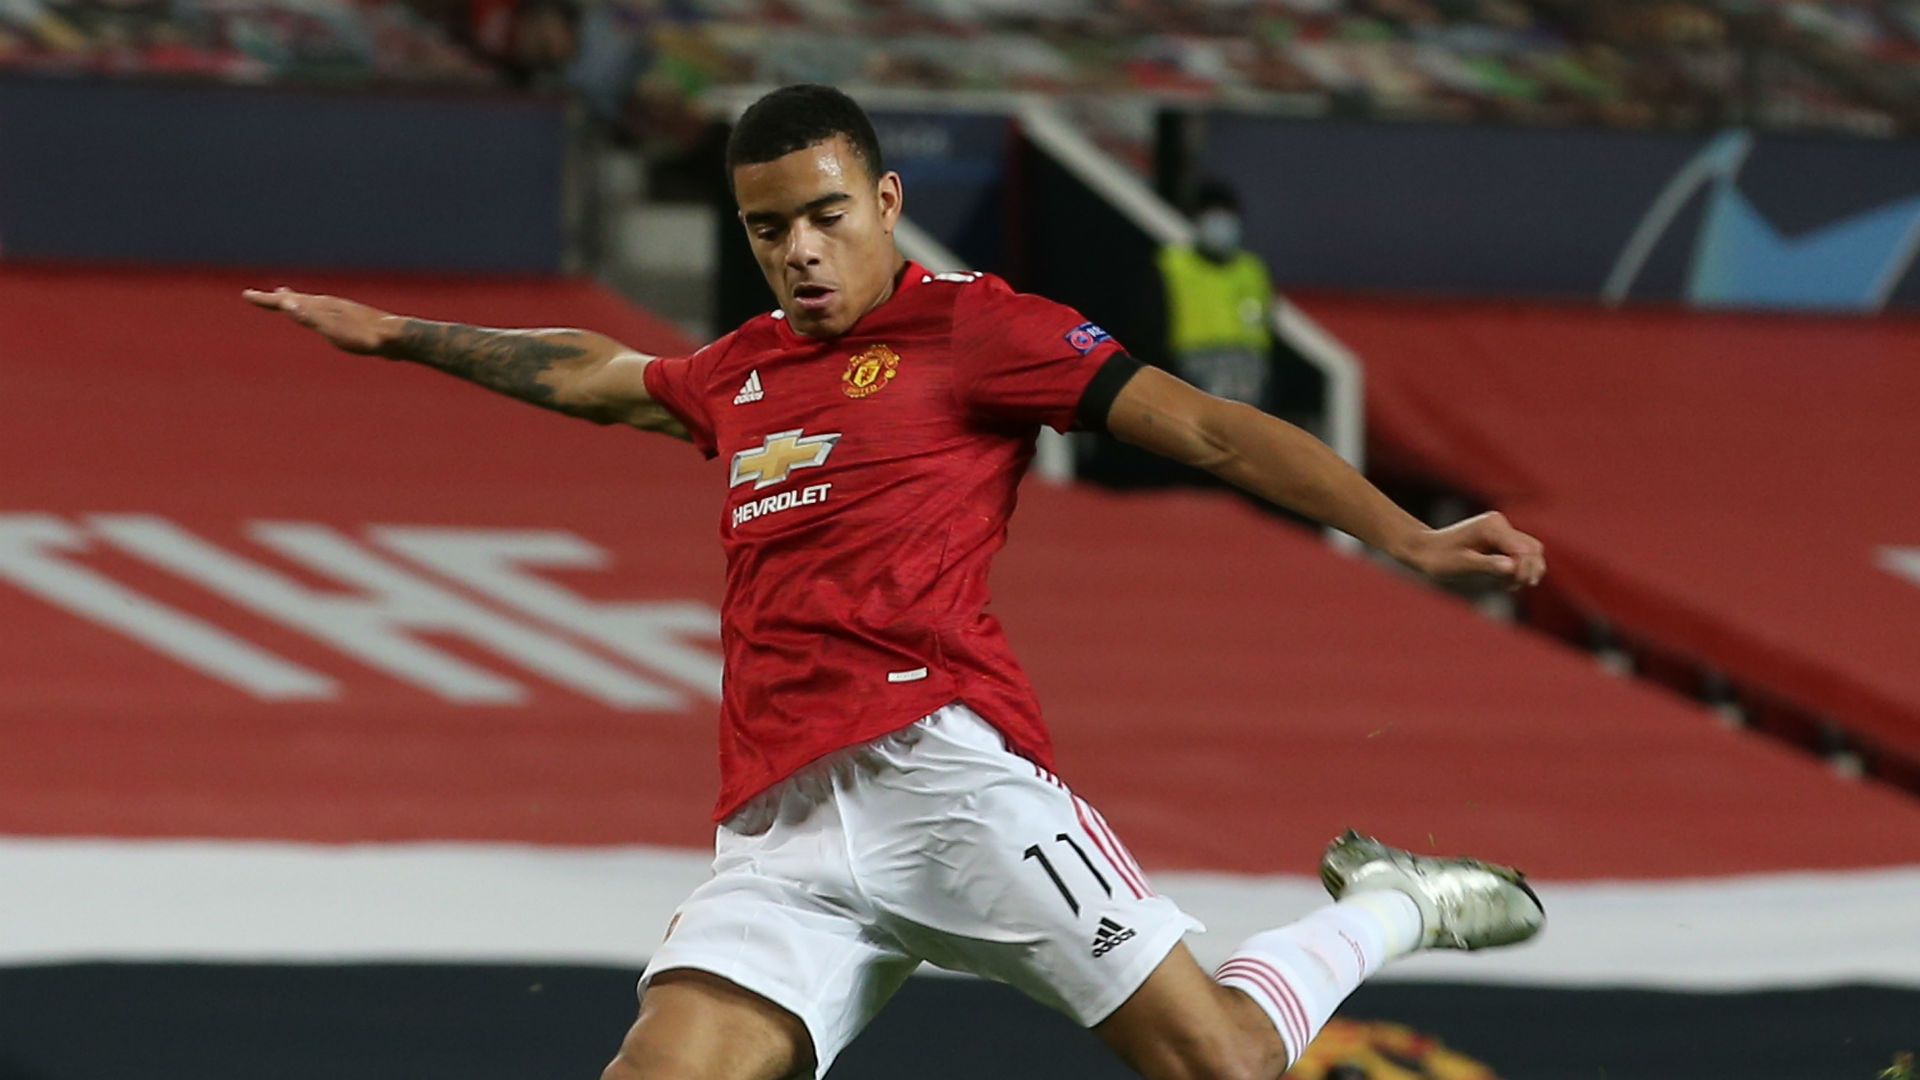 Greenwood returns for Man Utd as Van de Beek makes first Premier League start